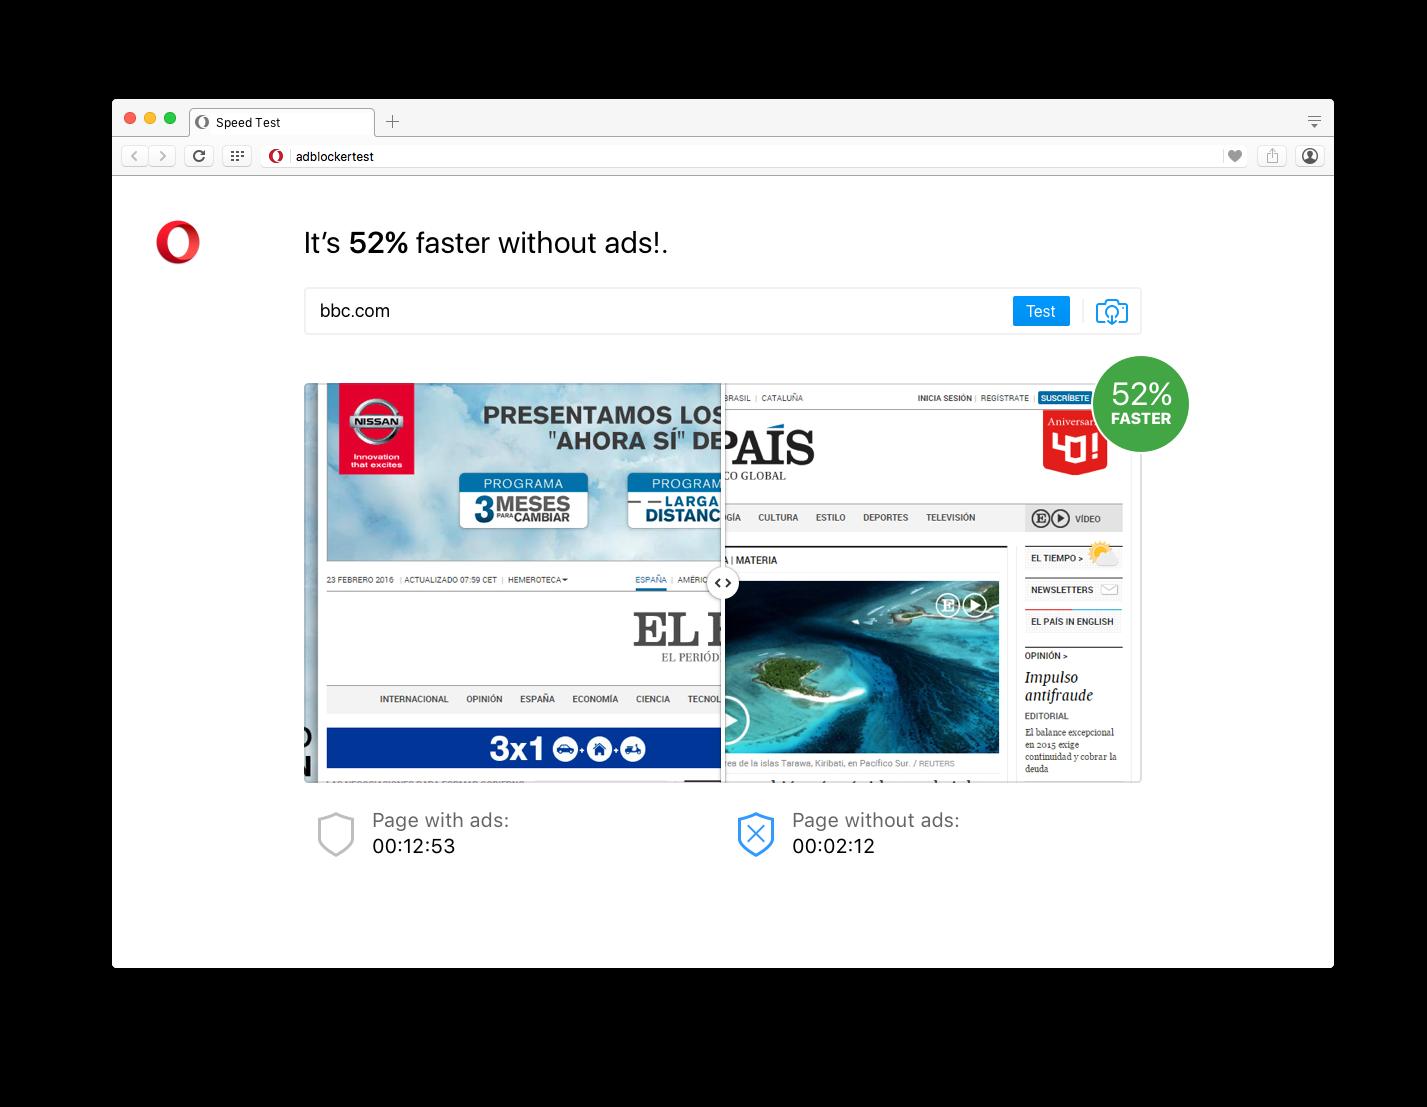 No-ad page benchmark